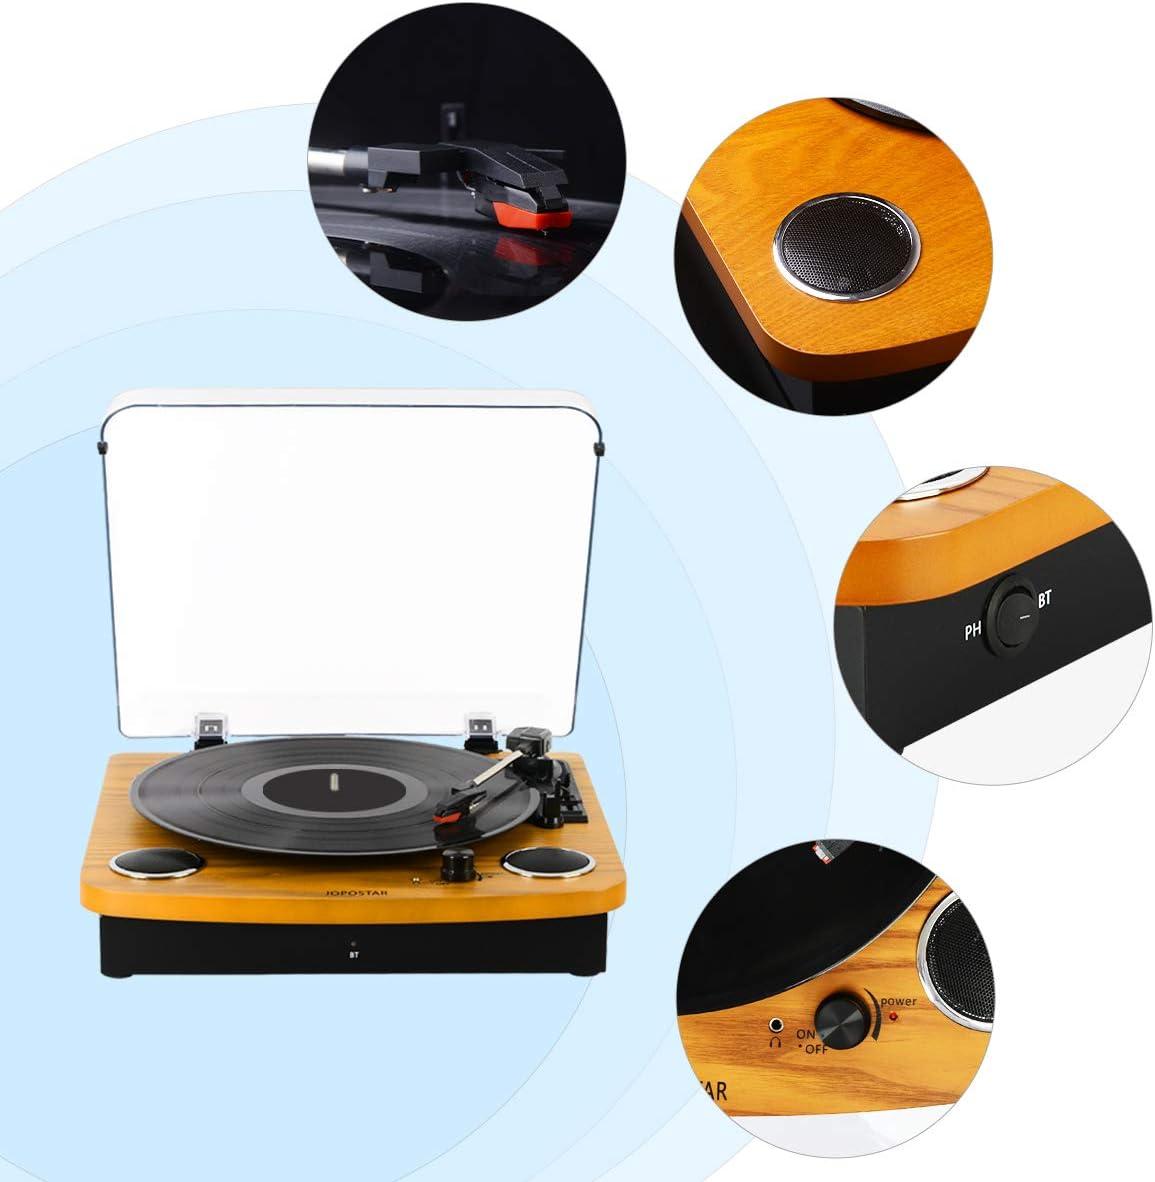 Amazon.com: JOPOSTAR - Tocadiscos con Bluetooth, reproductor ...